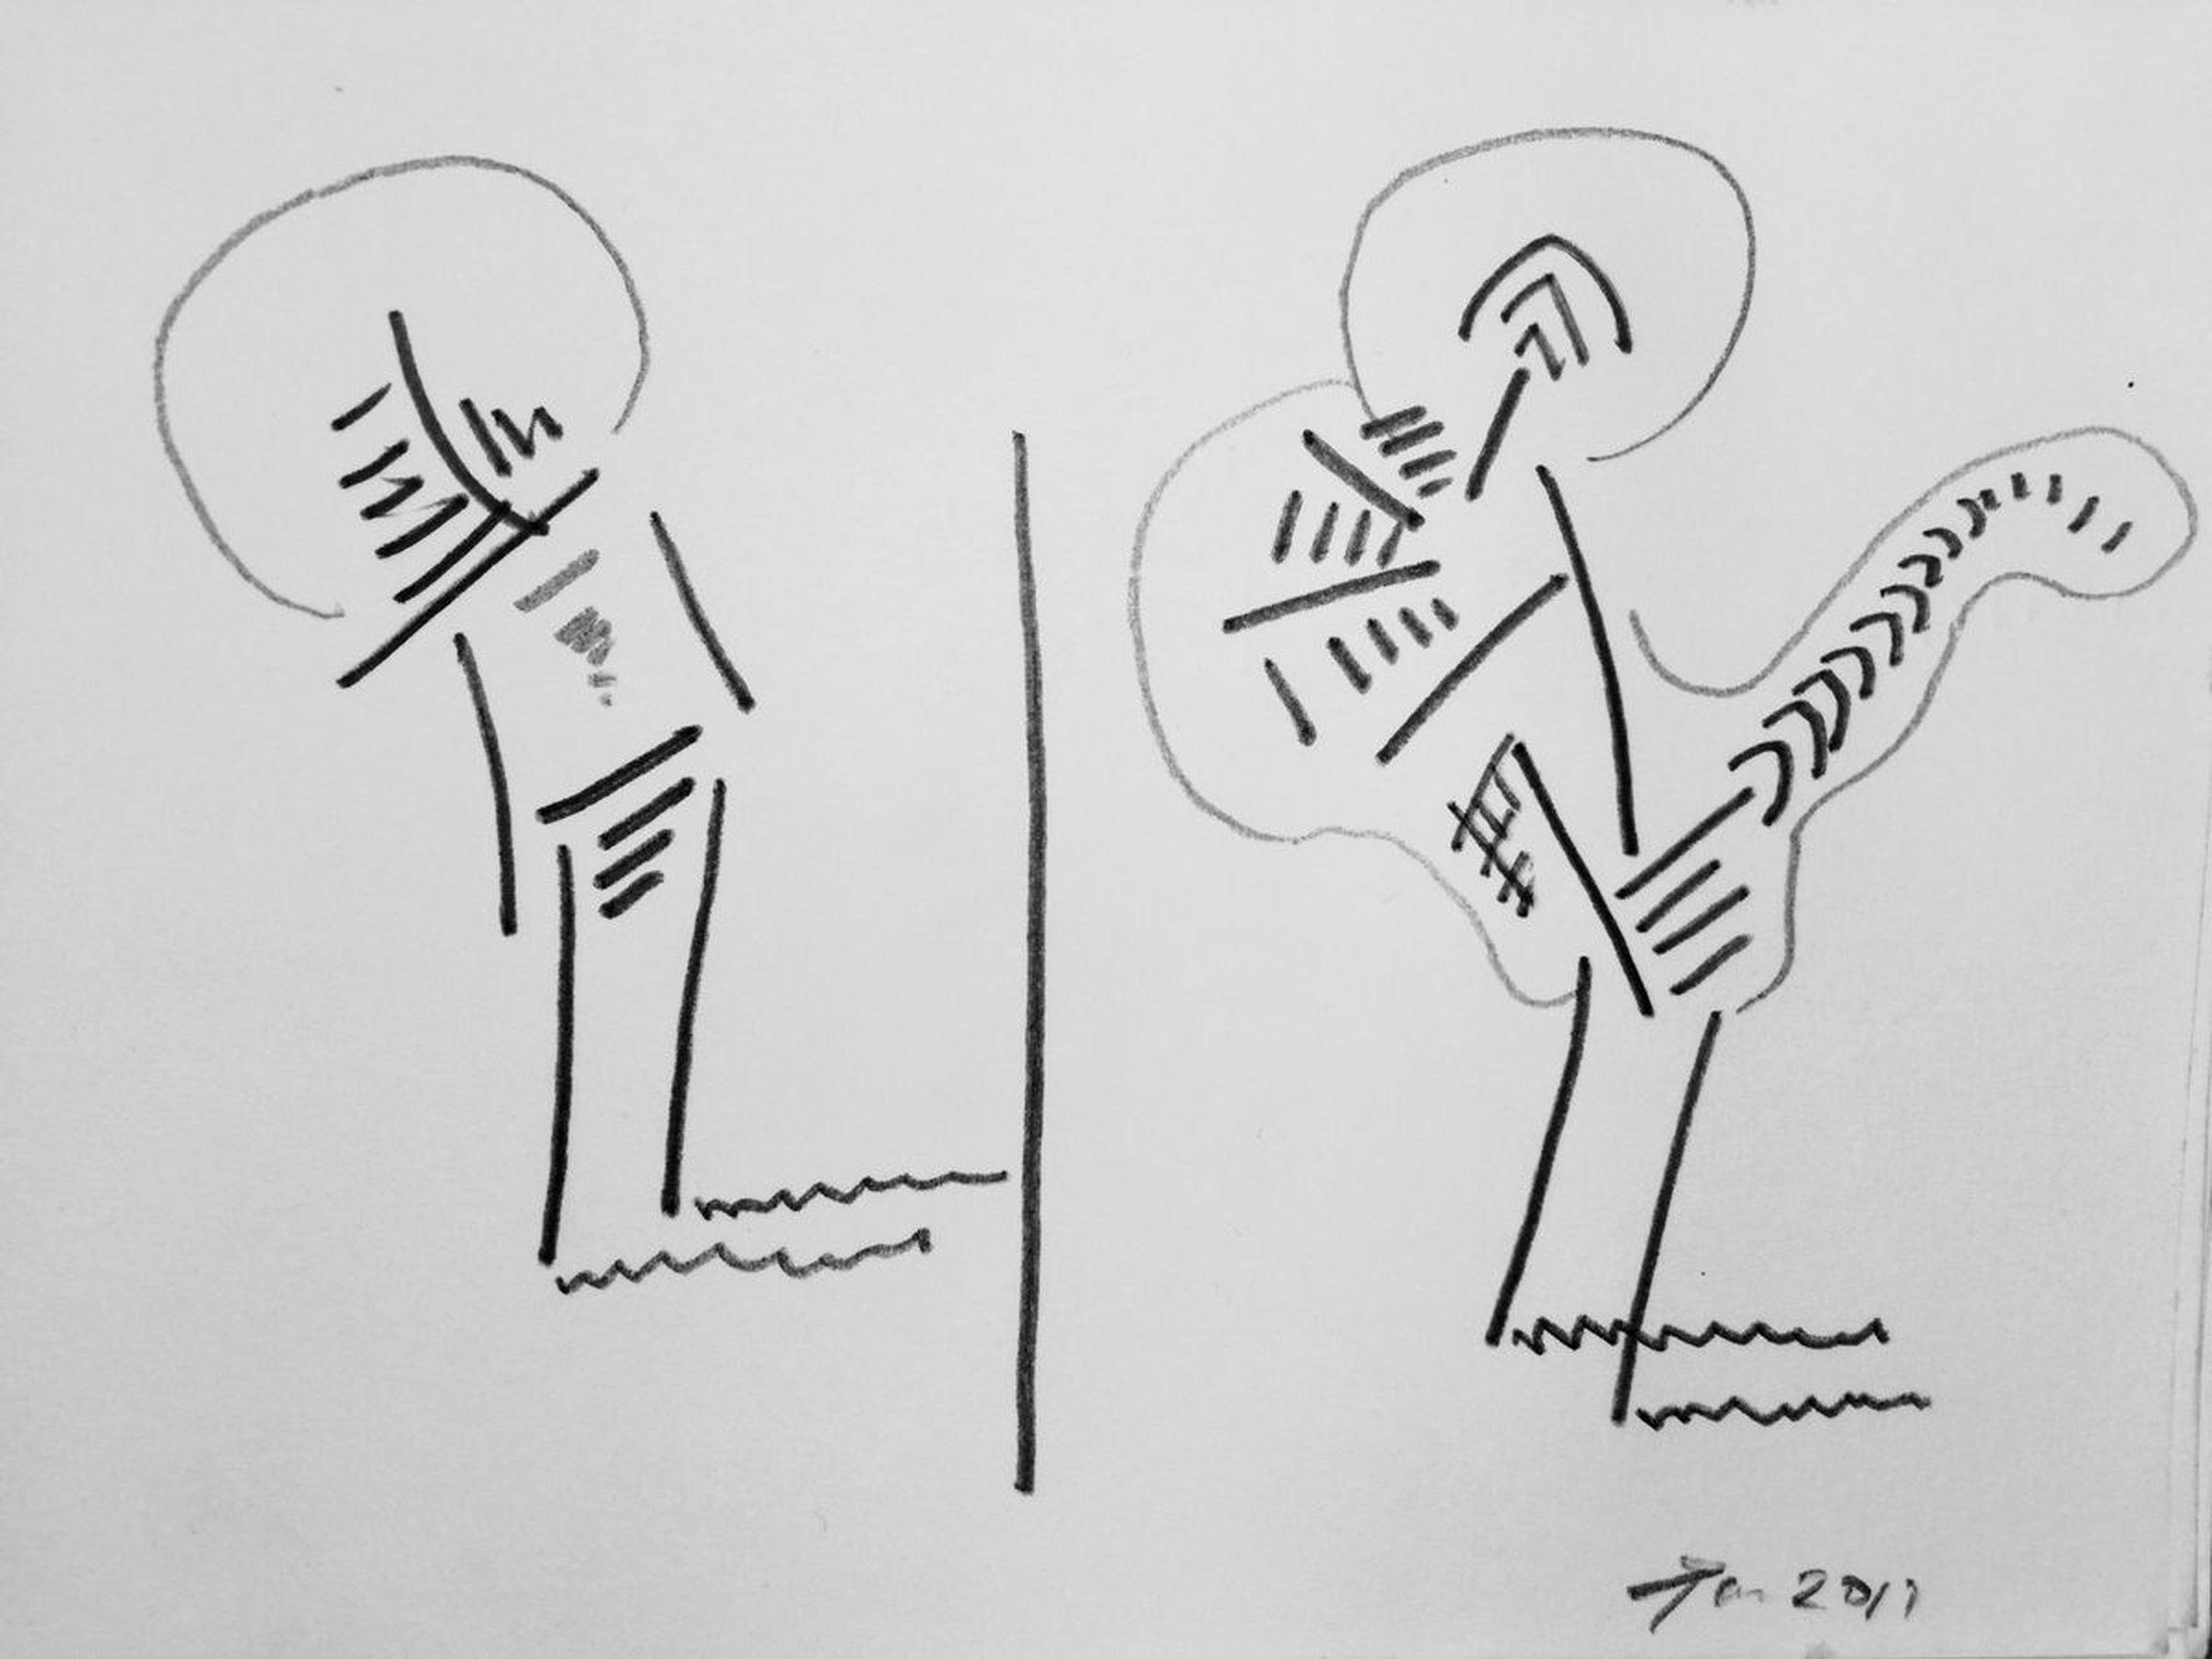 Zen solo 2017 pencil drawing